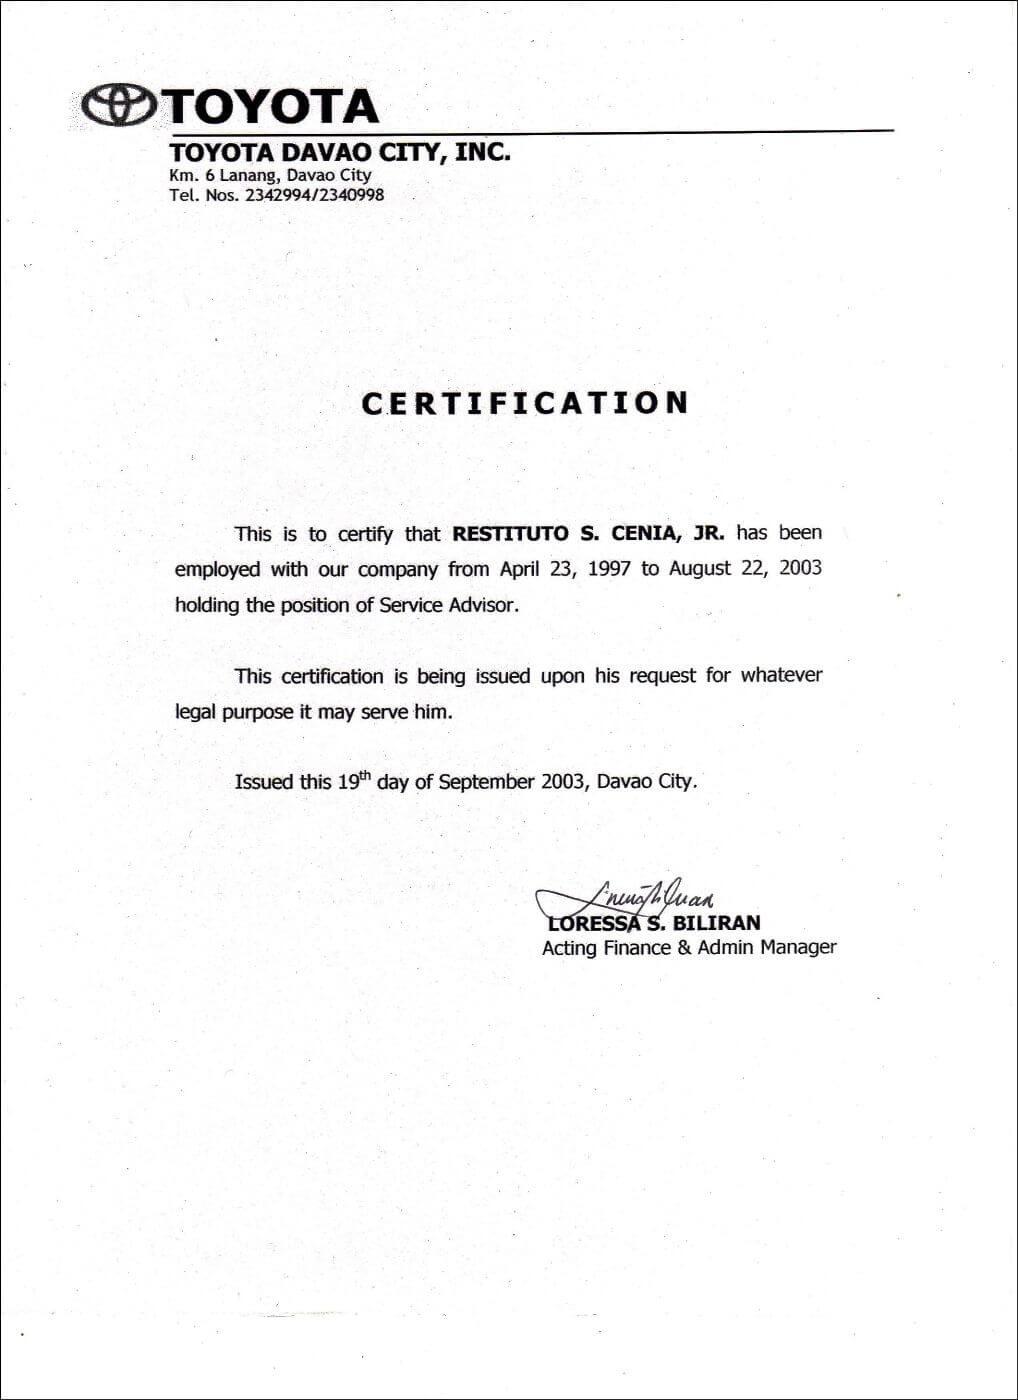 Employment Certificate Sample Best Templates Pinterest With Certificate Of Employment Template